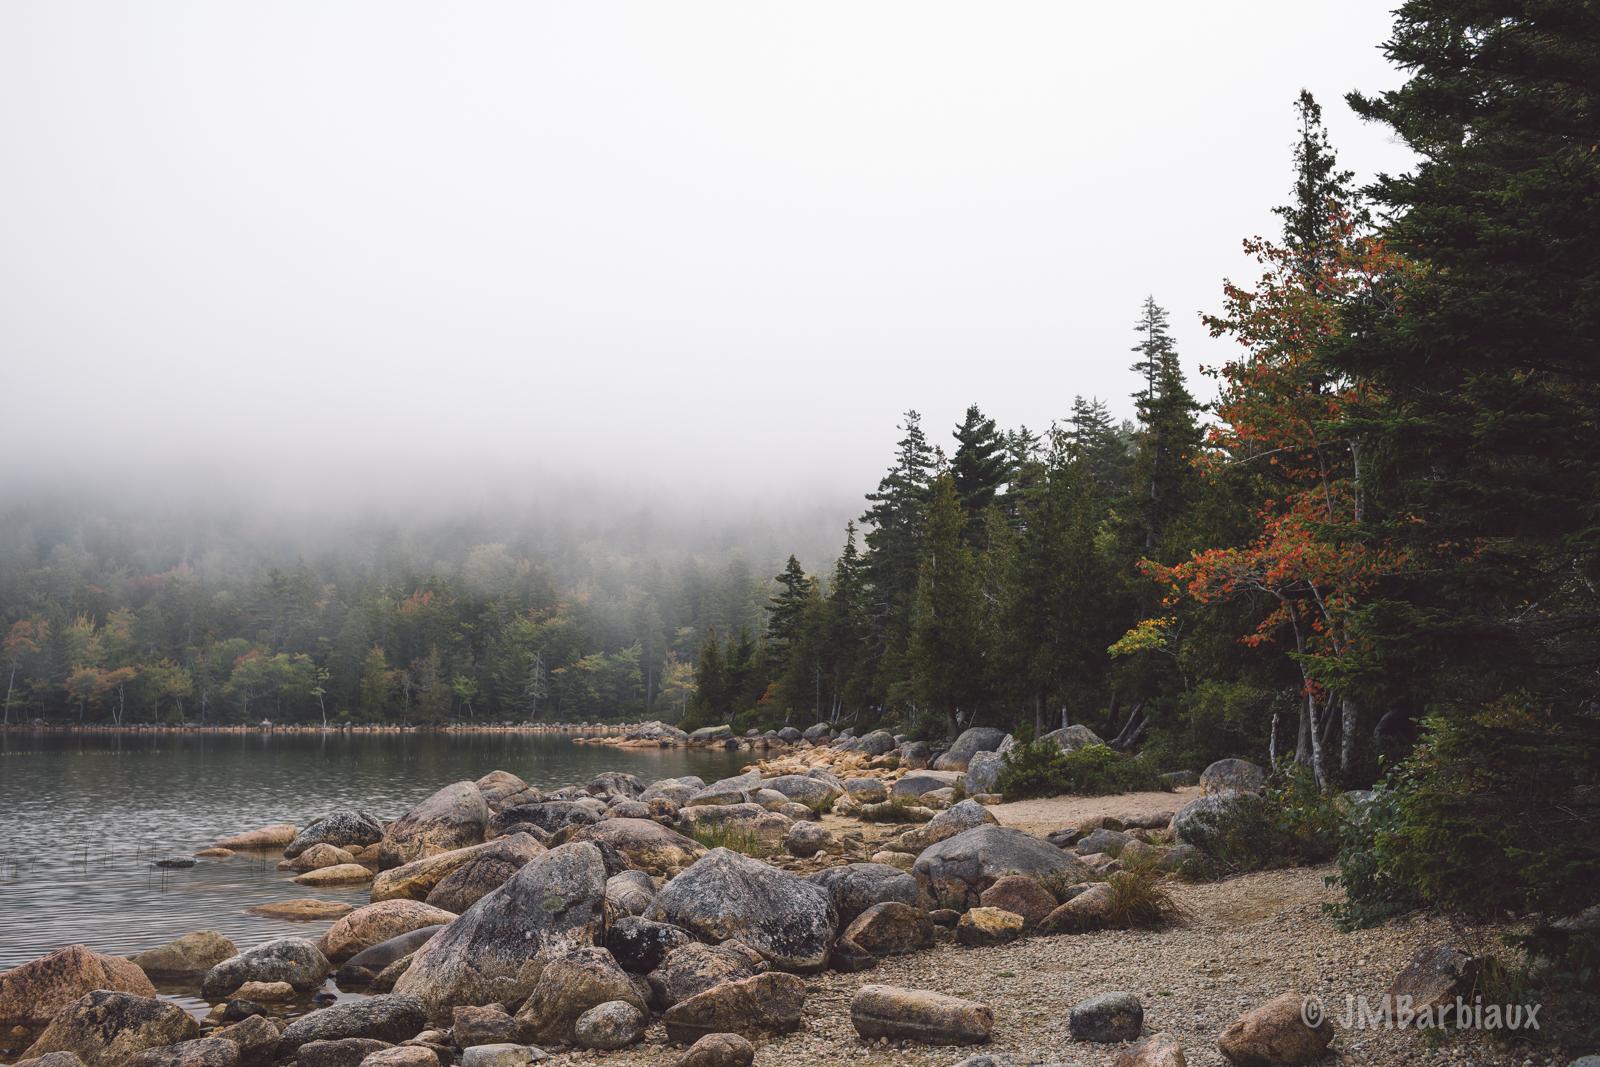 acadia National park, maine, fog, hiking, jordan pond, travel, weather